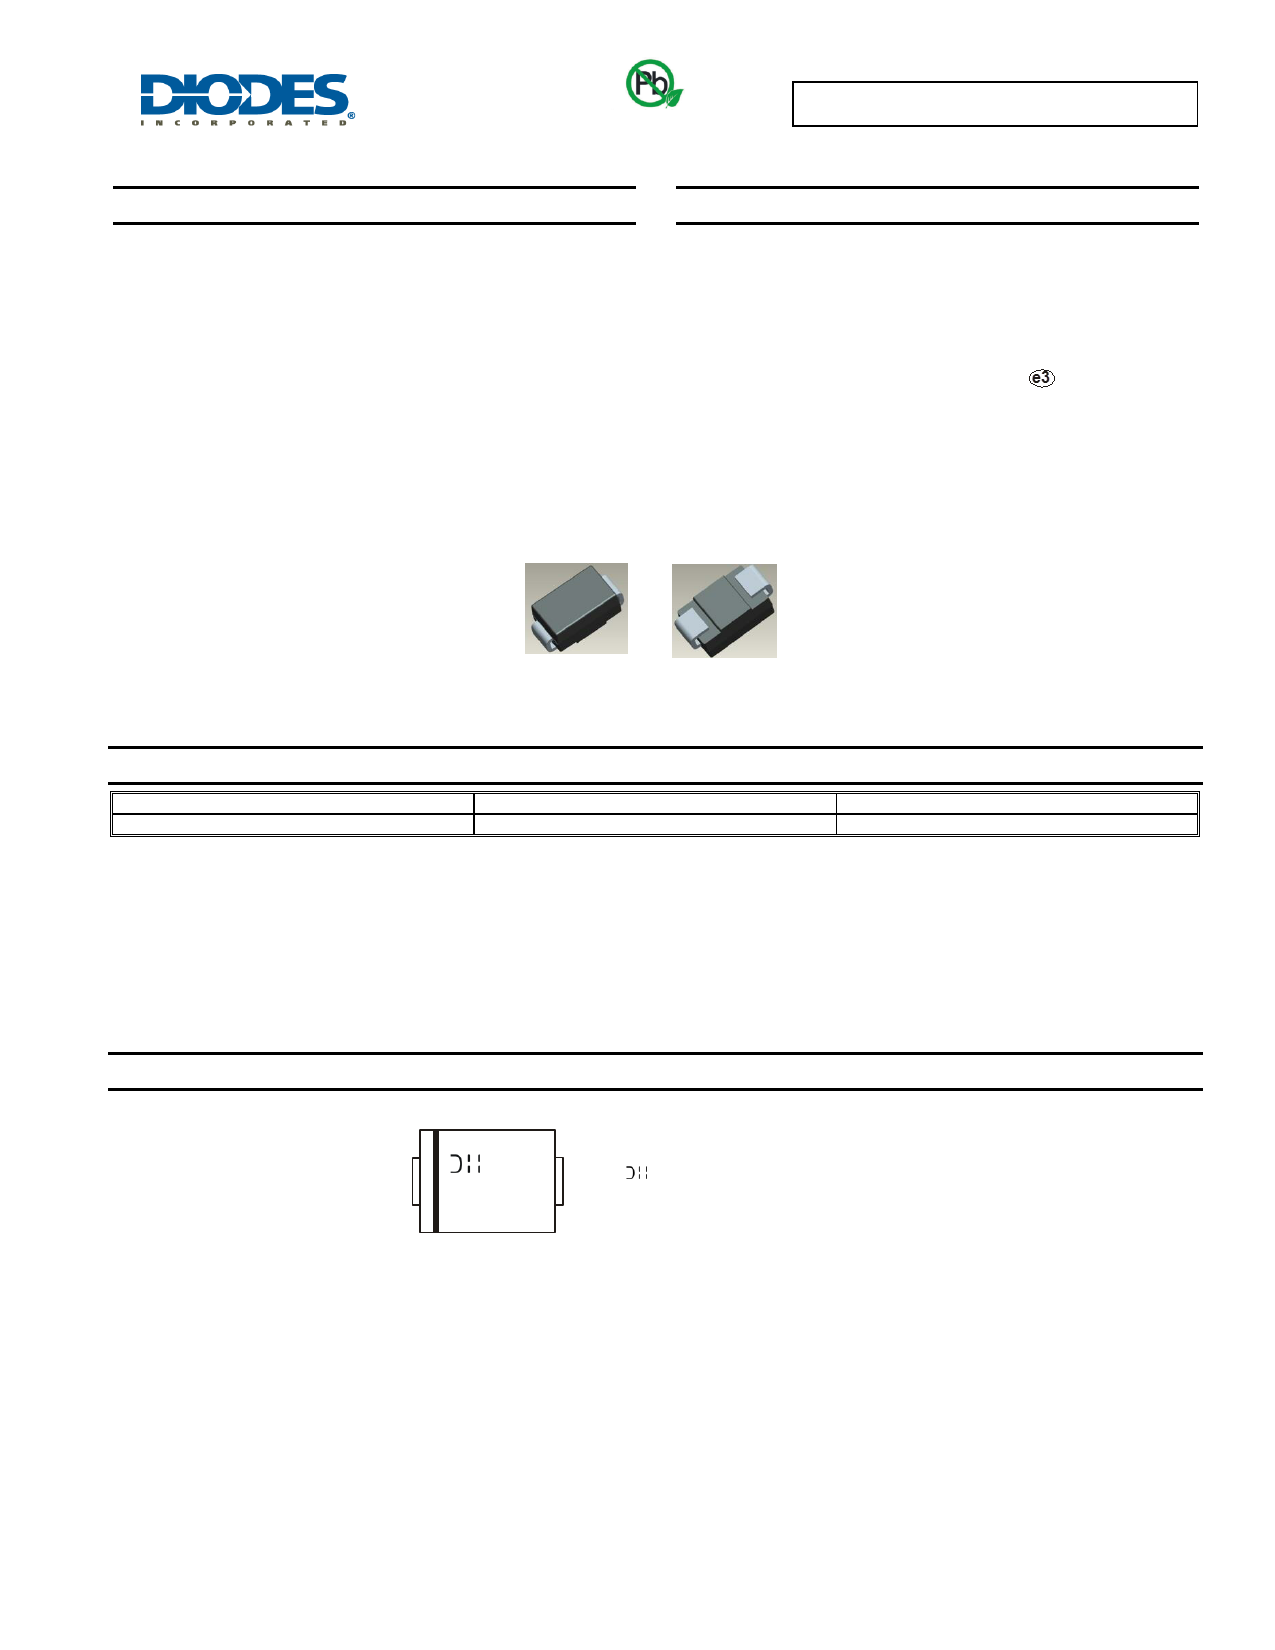 SMAJ7.5A datasheet